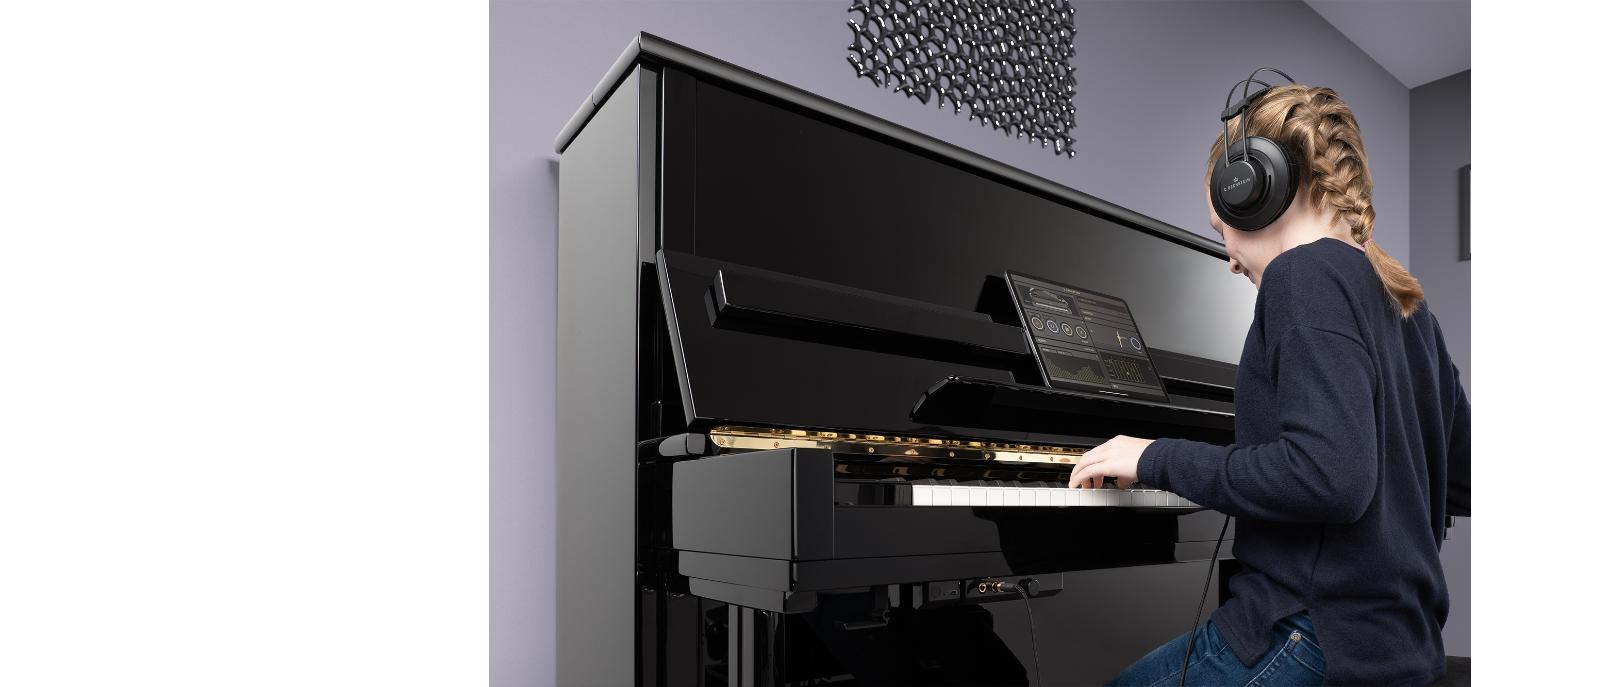 CBD_VARIO_Maedchen_am_Klavier_2000px